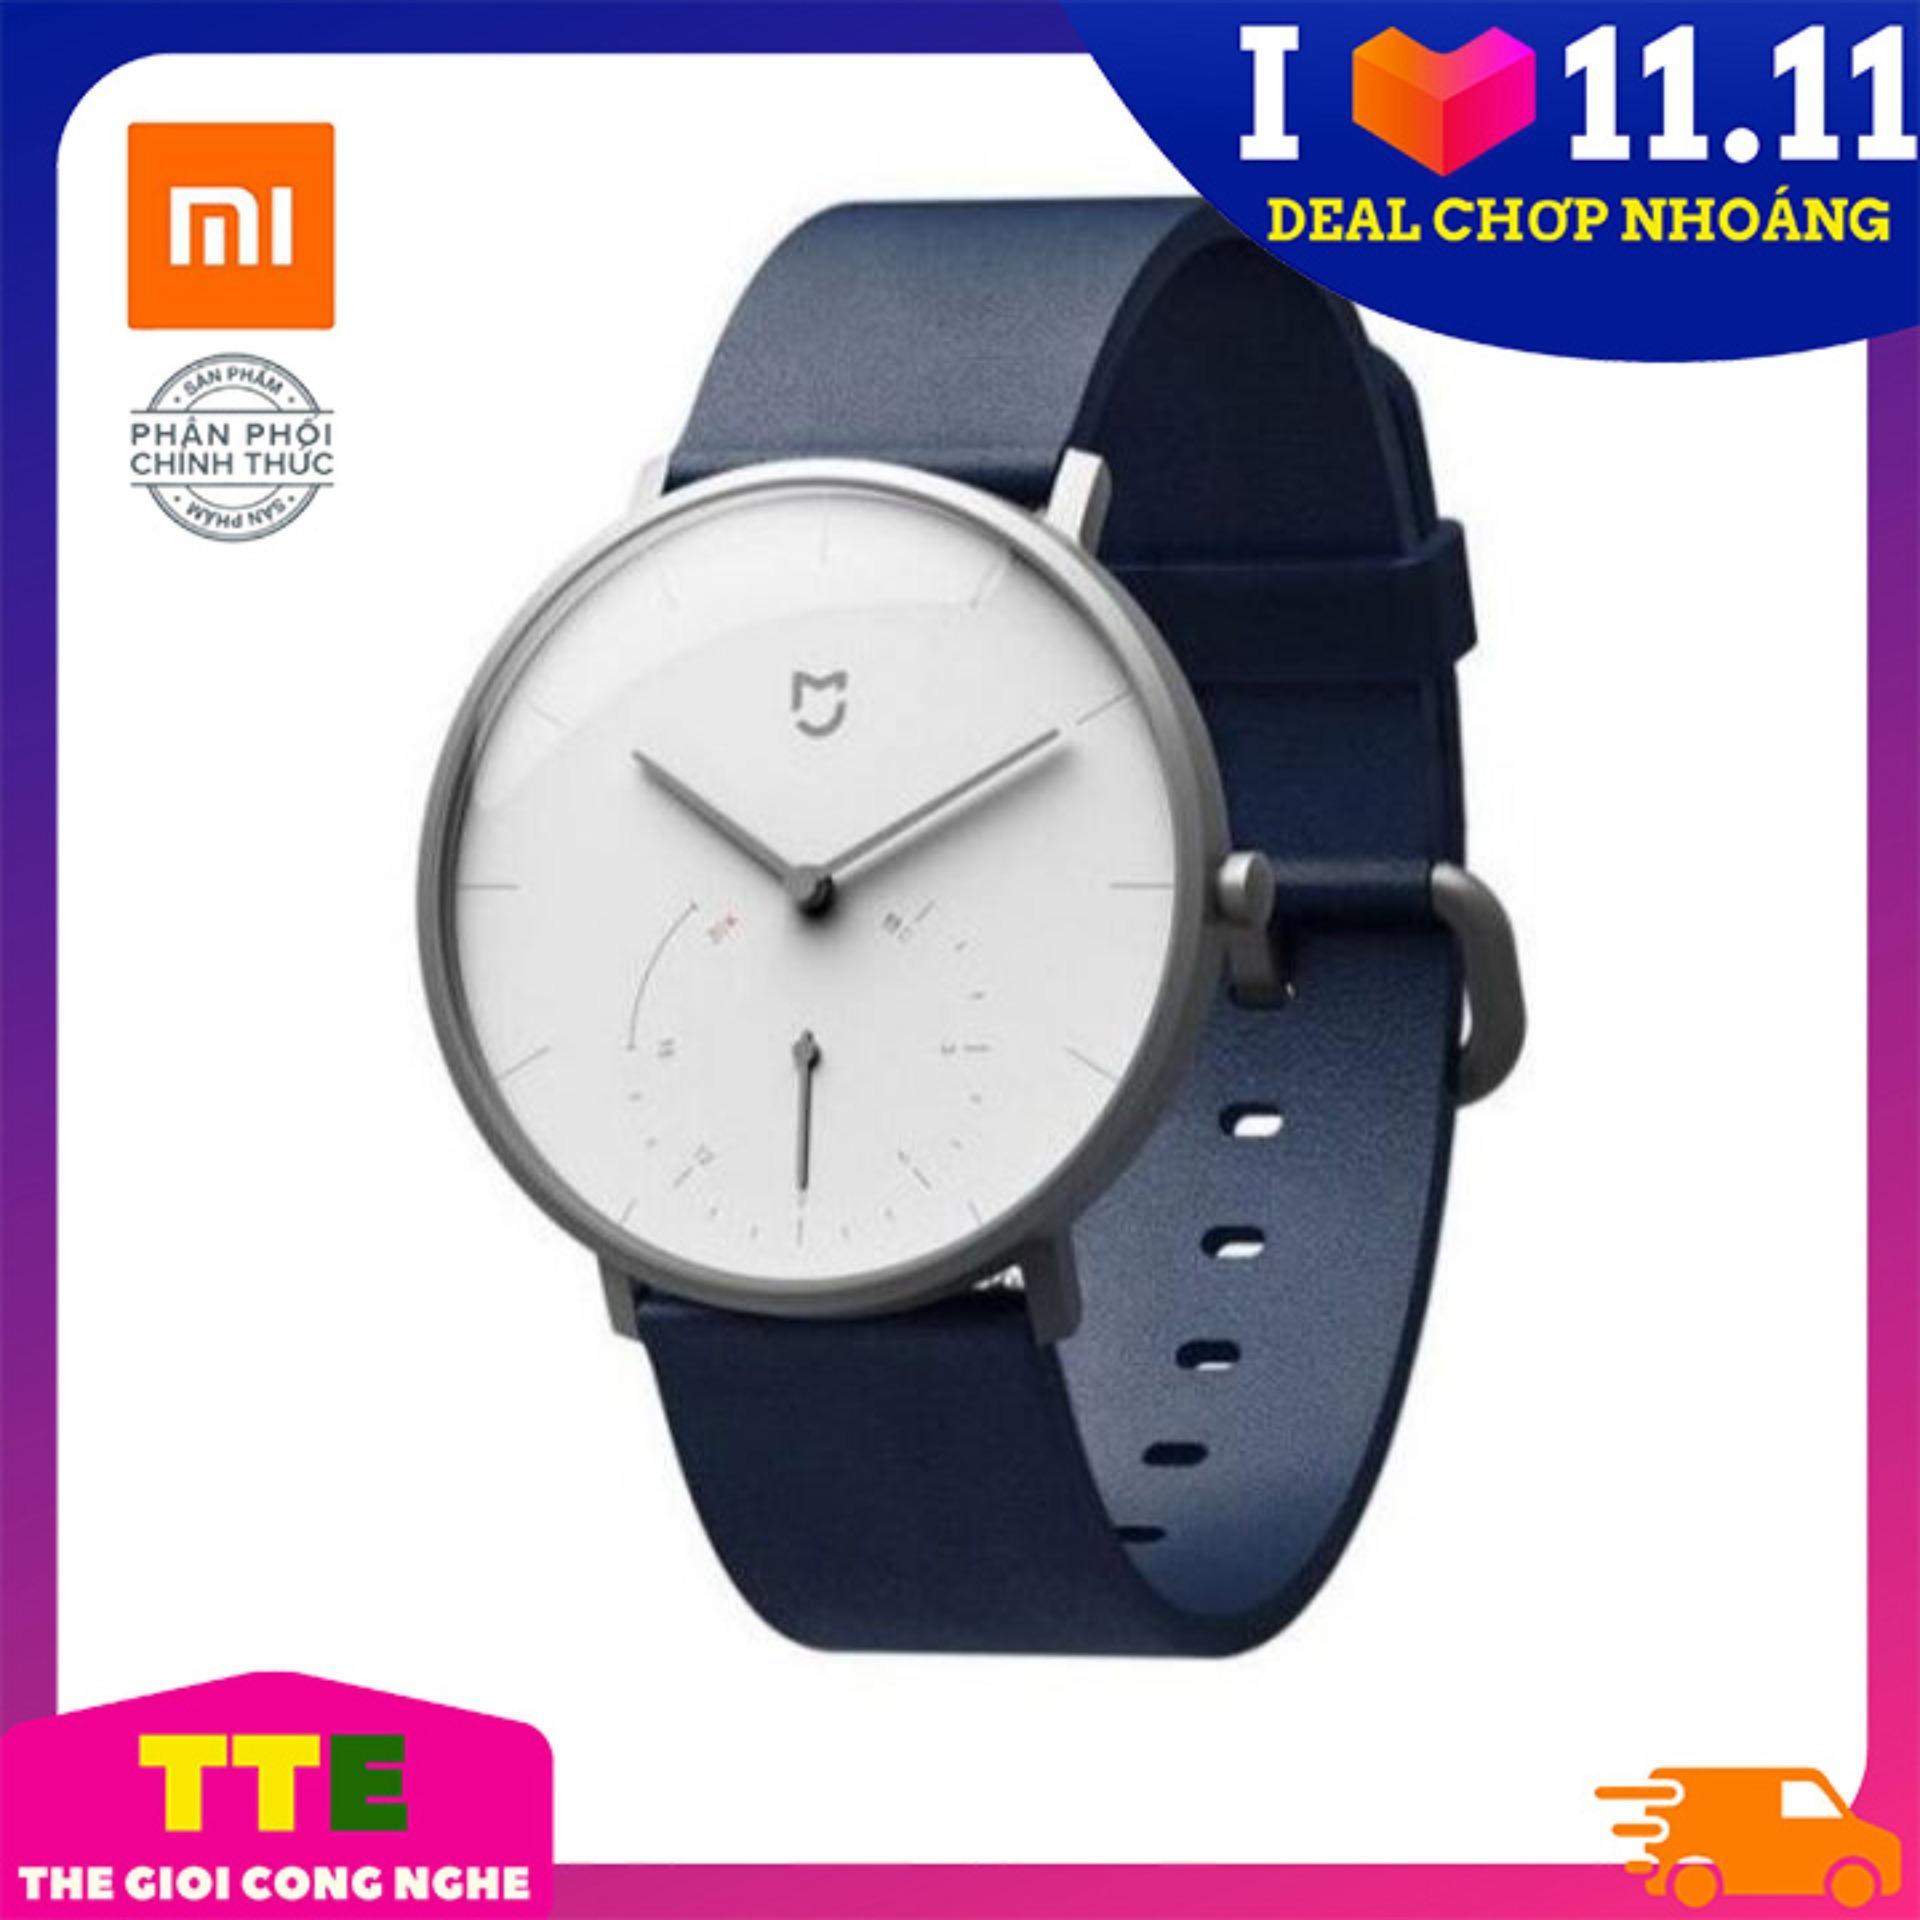 Đồng hồ Xiaomi Mijia Quartz Watch - Flash Sale